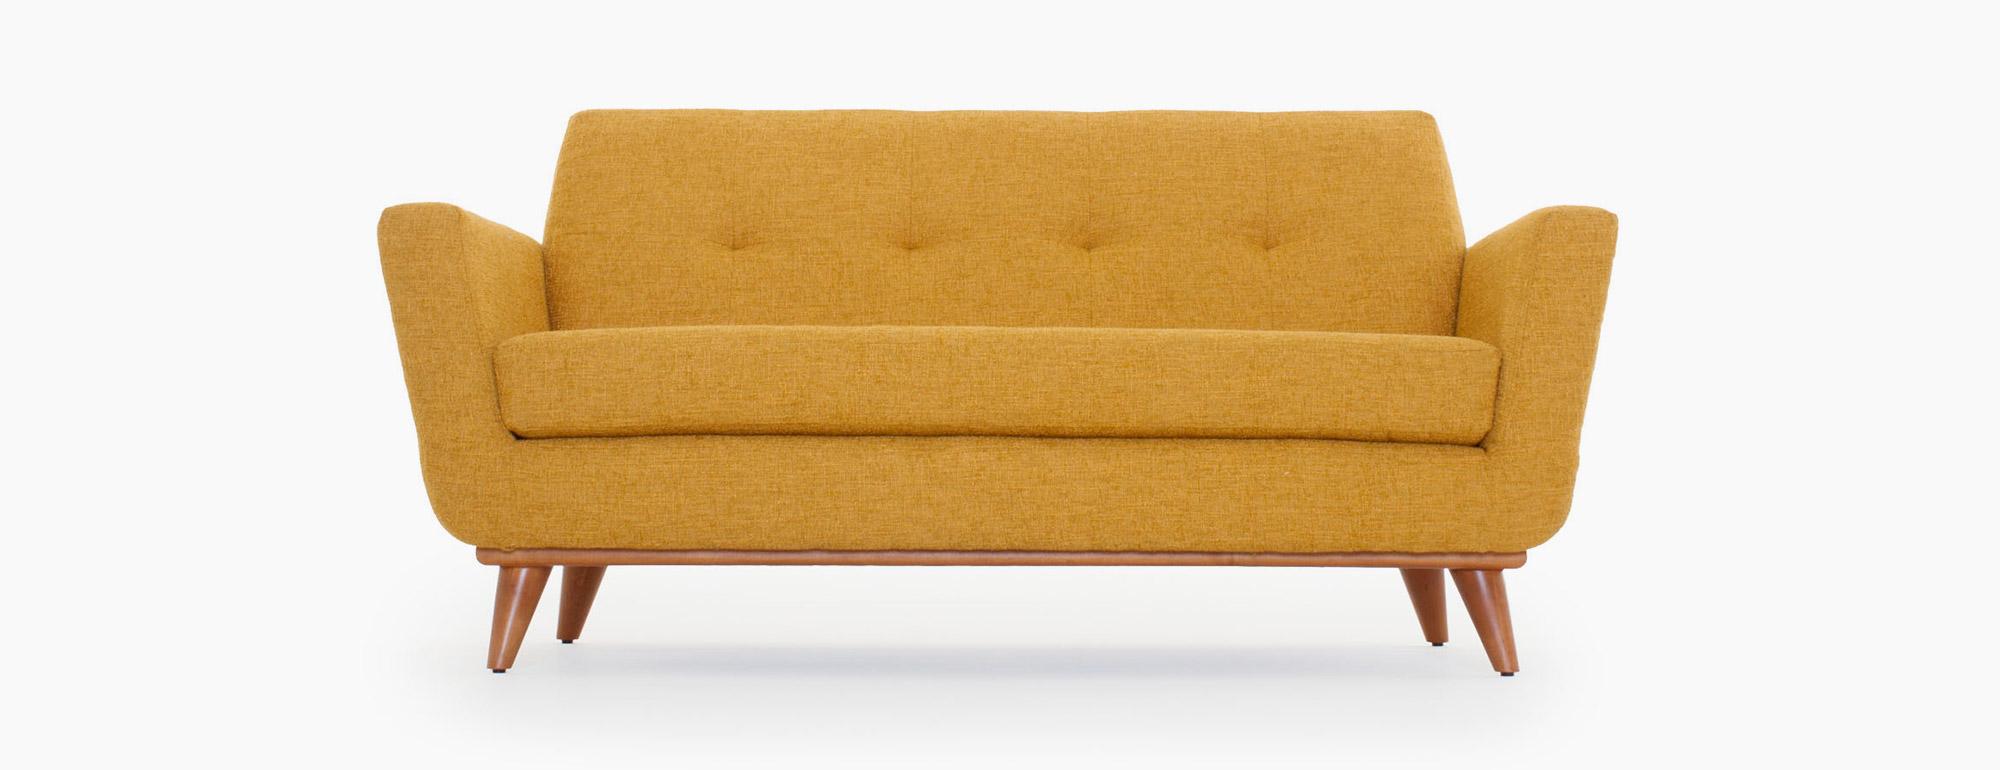 hero-hughes-apartment-sofa-1